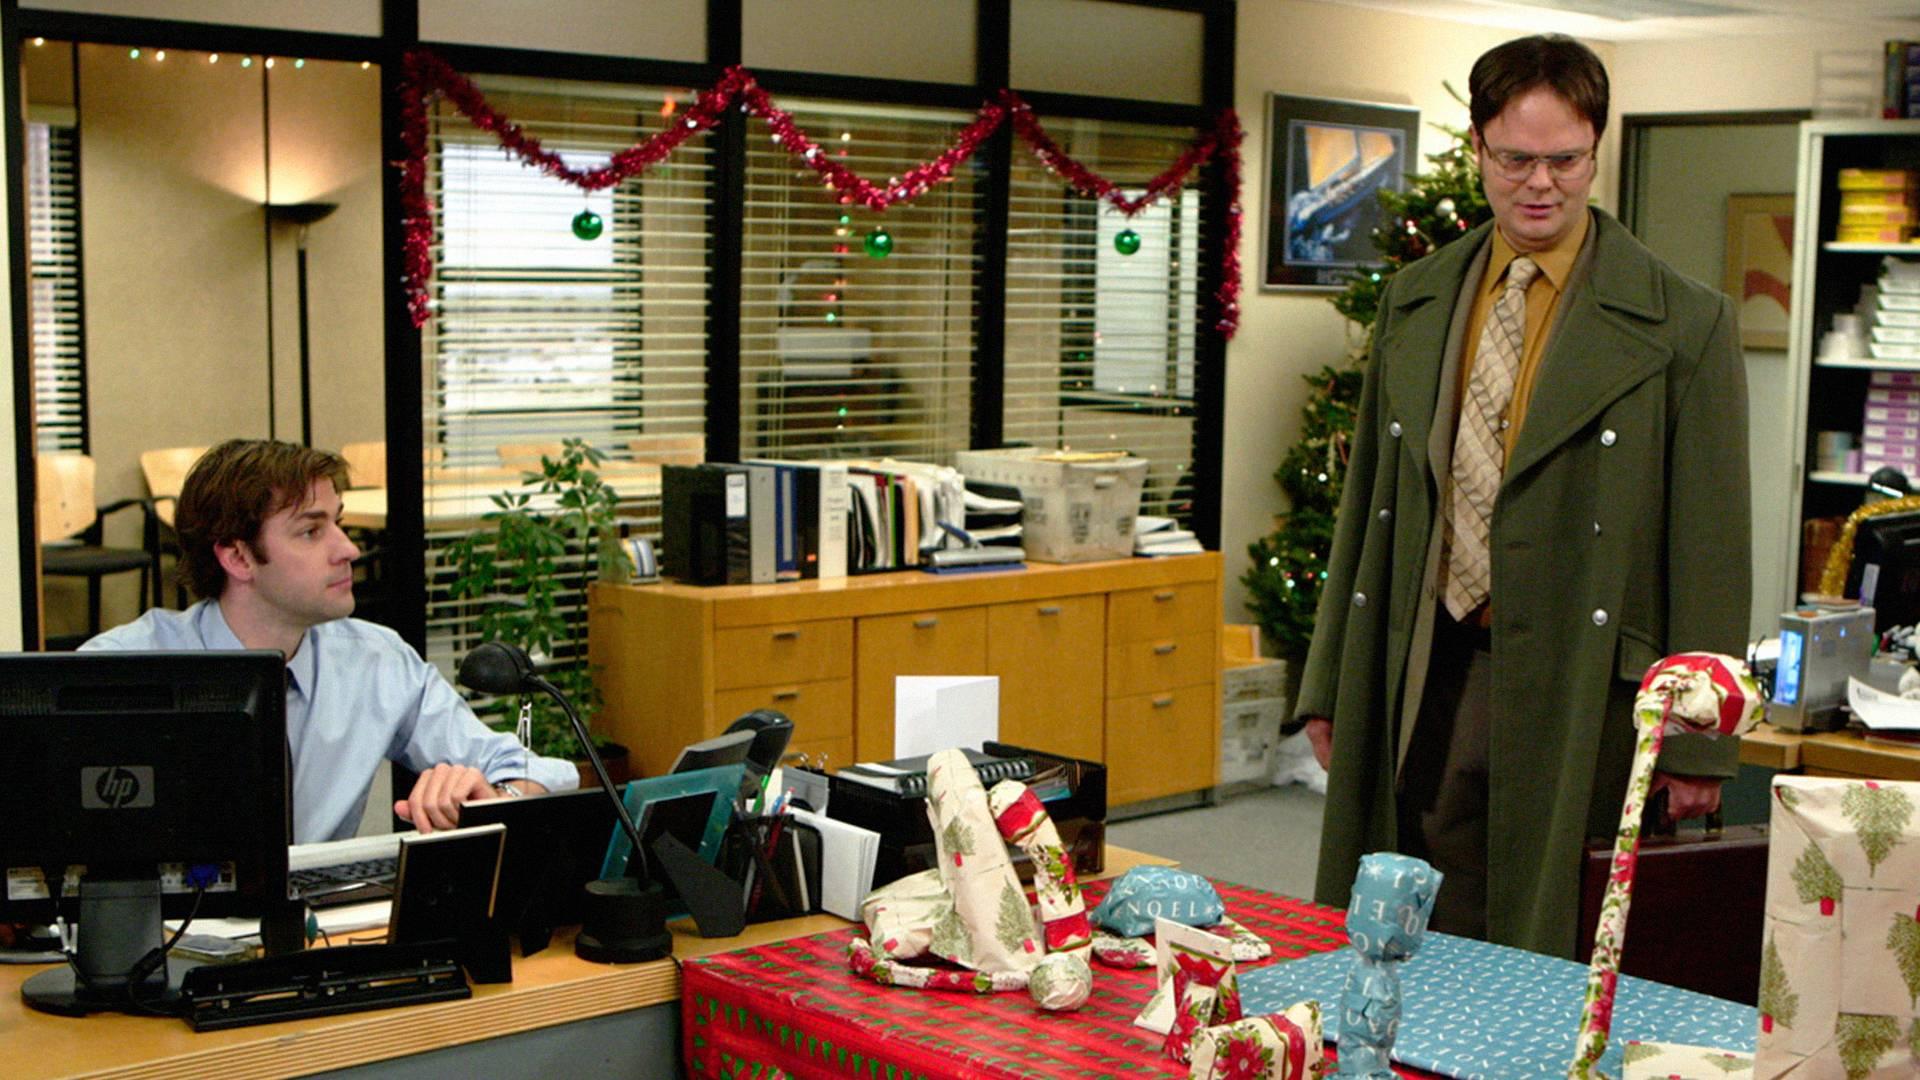 The Office Season 5 Episode 11